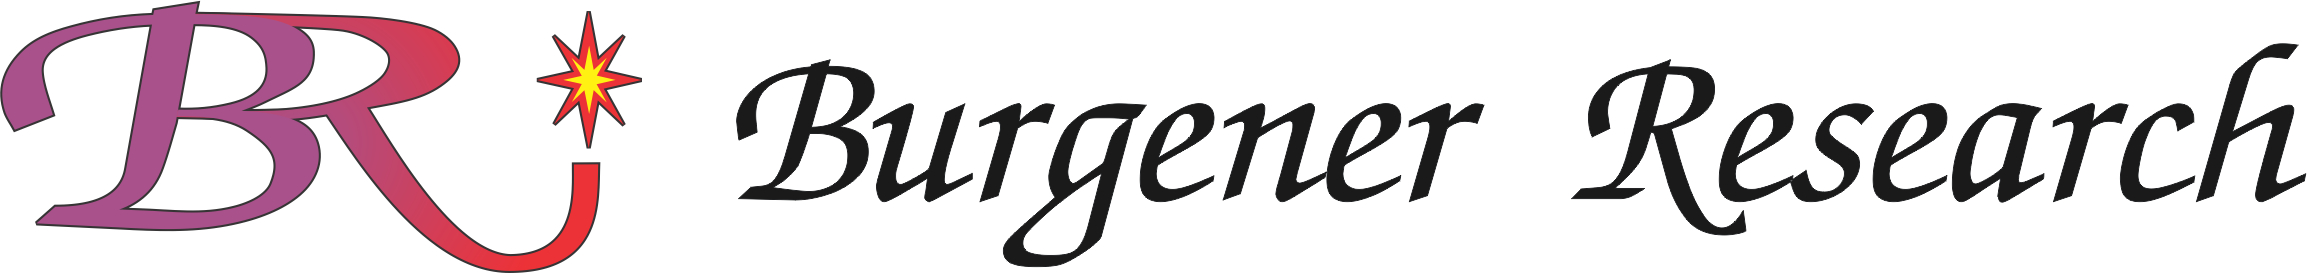 Burgener Research